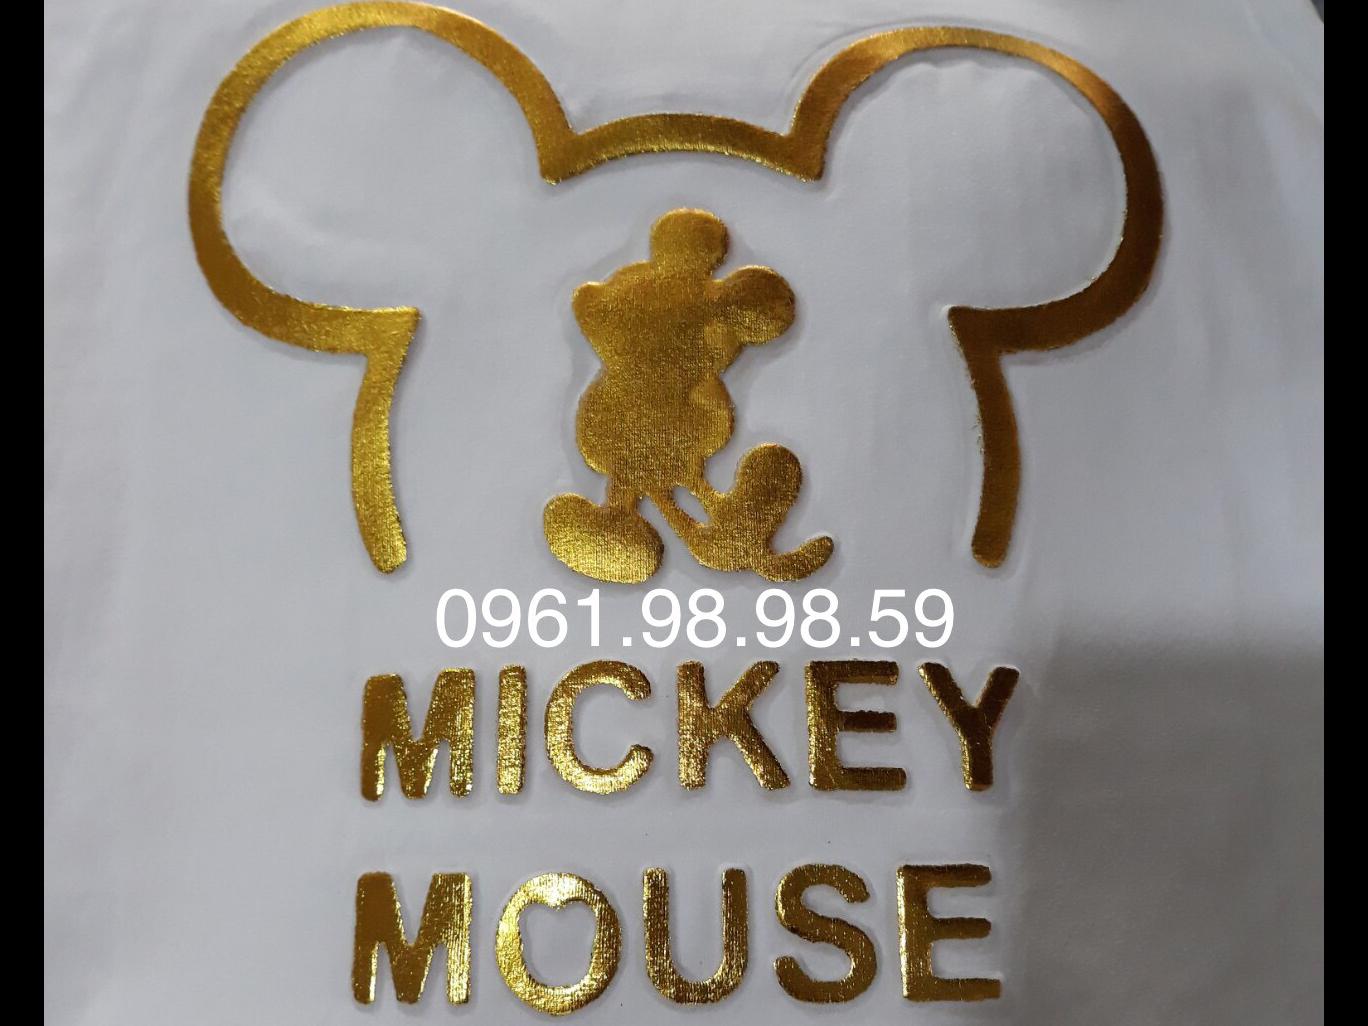 dap noi mickey